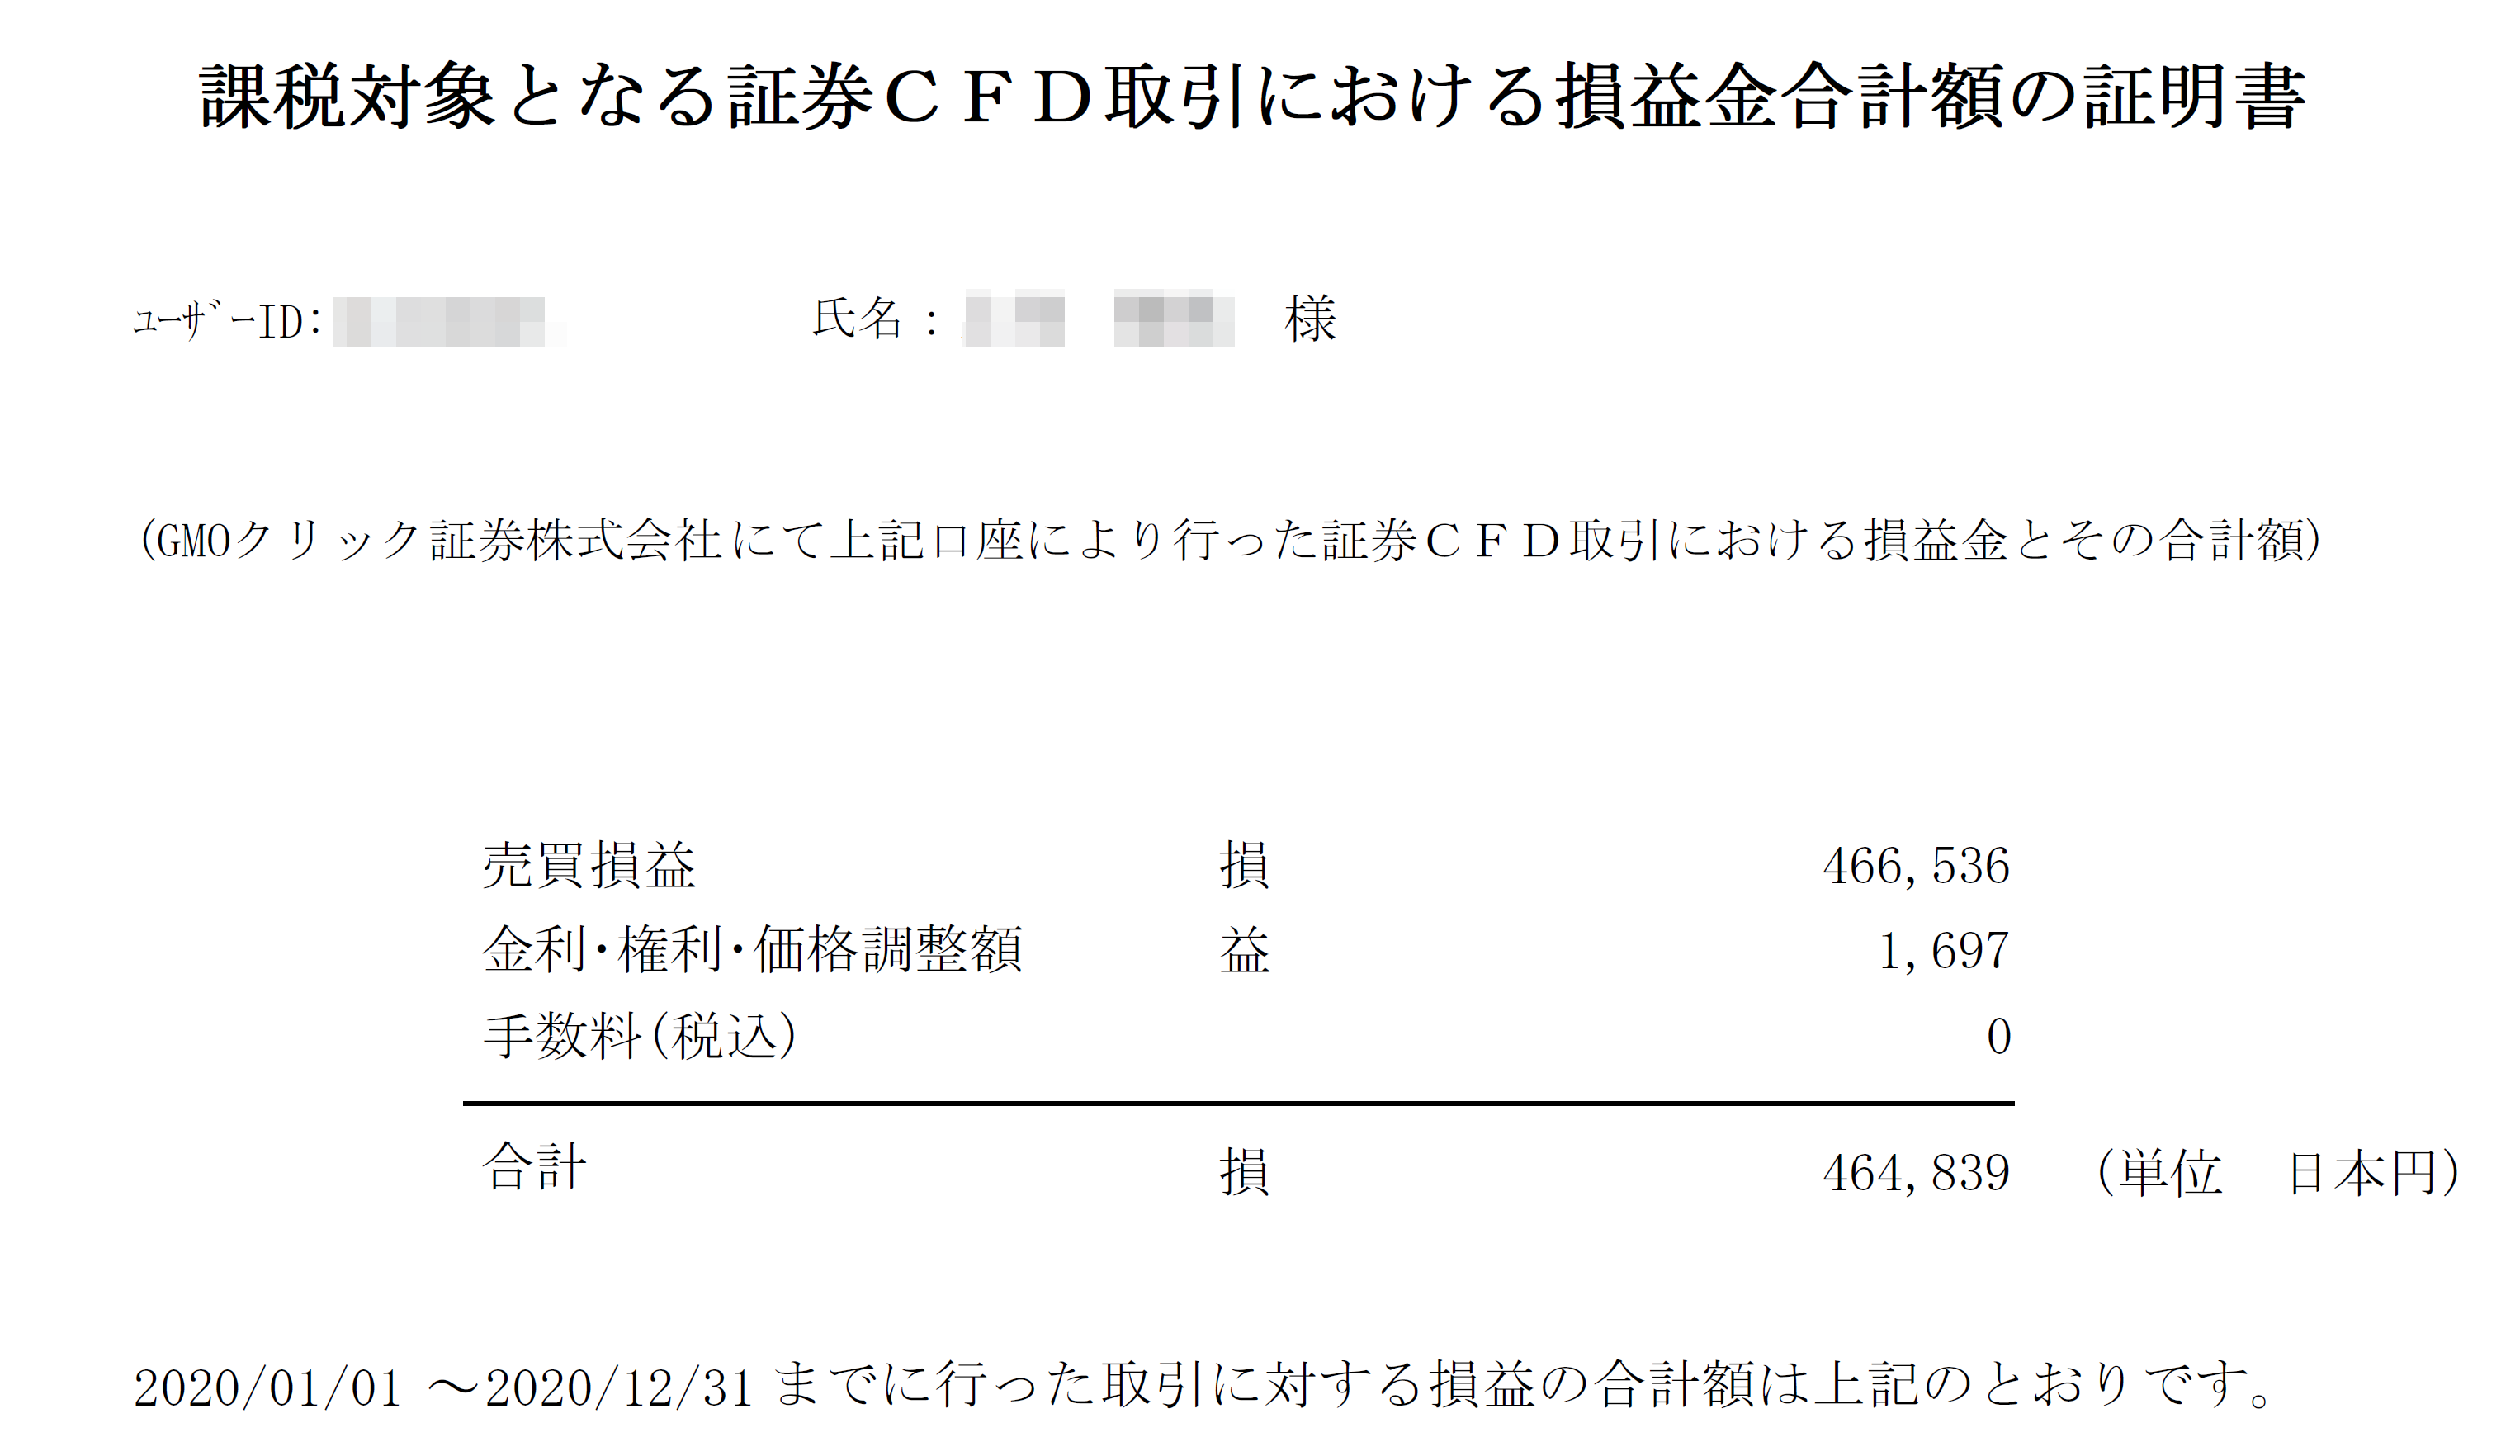 f:id:hodo-work:20210127205202p:plain